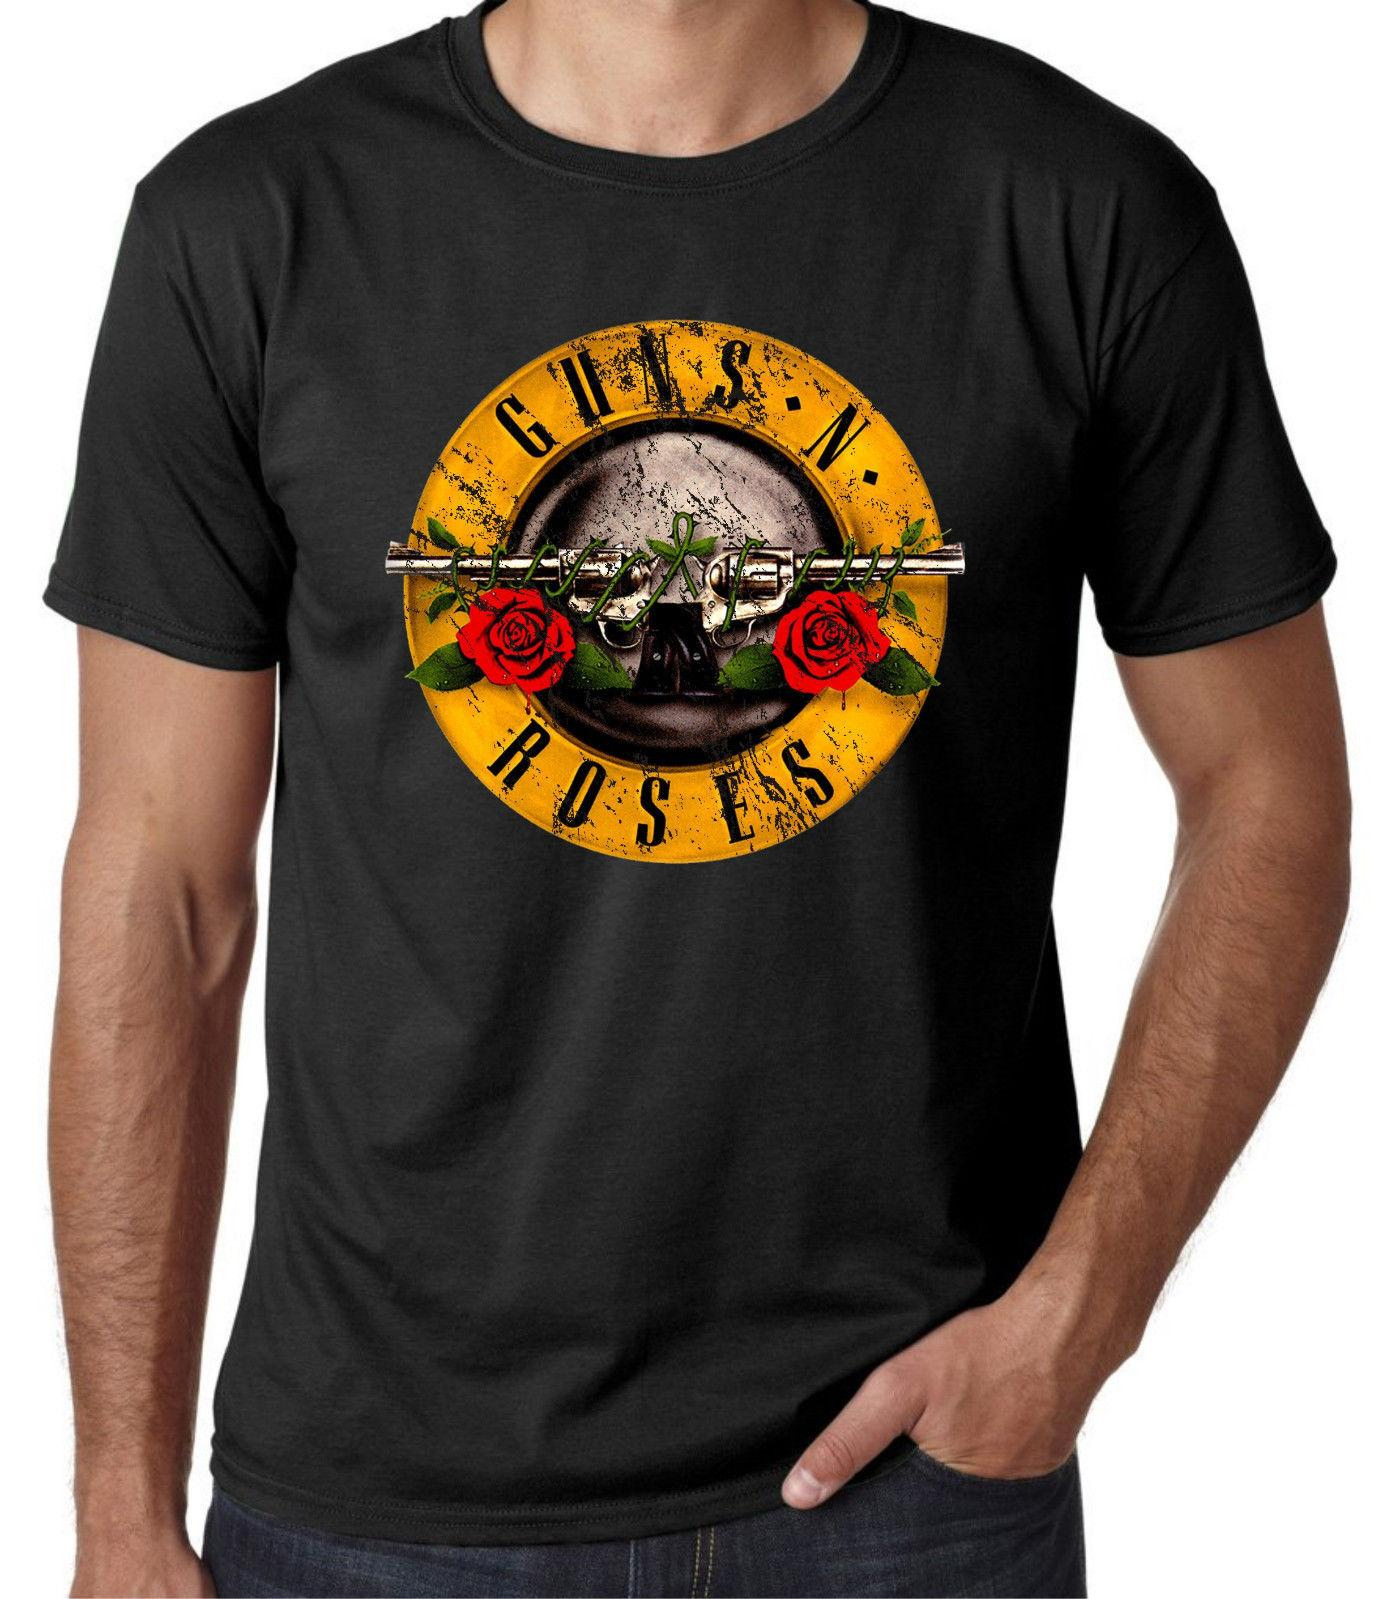 10449287c81 Guns An Roses T Shirt Vintage Mens Women Unisex Black Rose Rock Band Music  Hipster New 2018 Hot Summer Casual Printing Men S Cool Tshirts Printed  Crazy ...